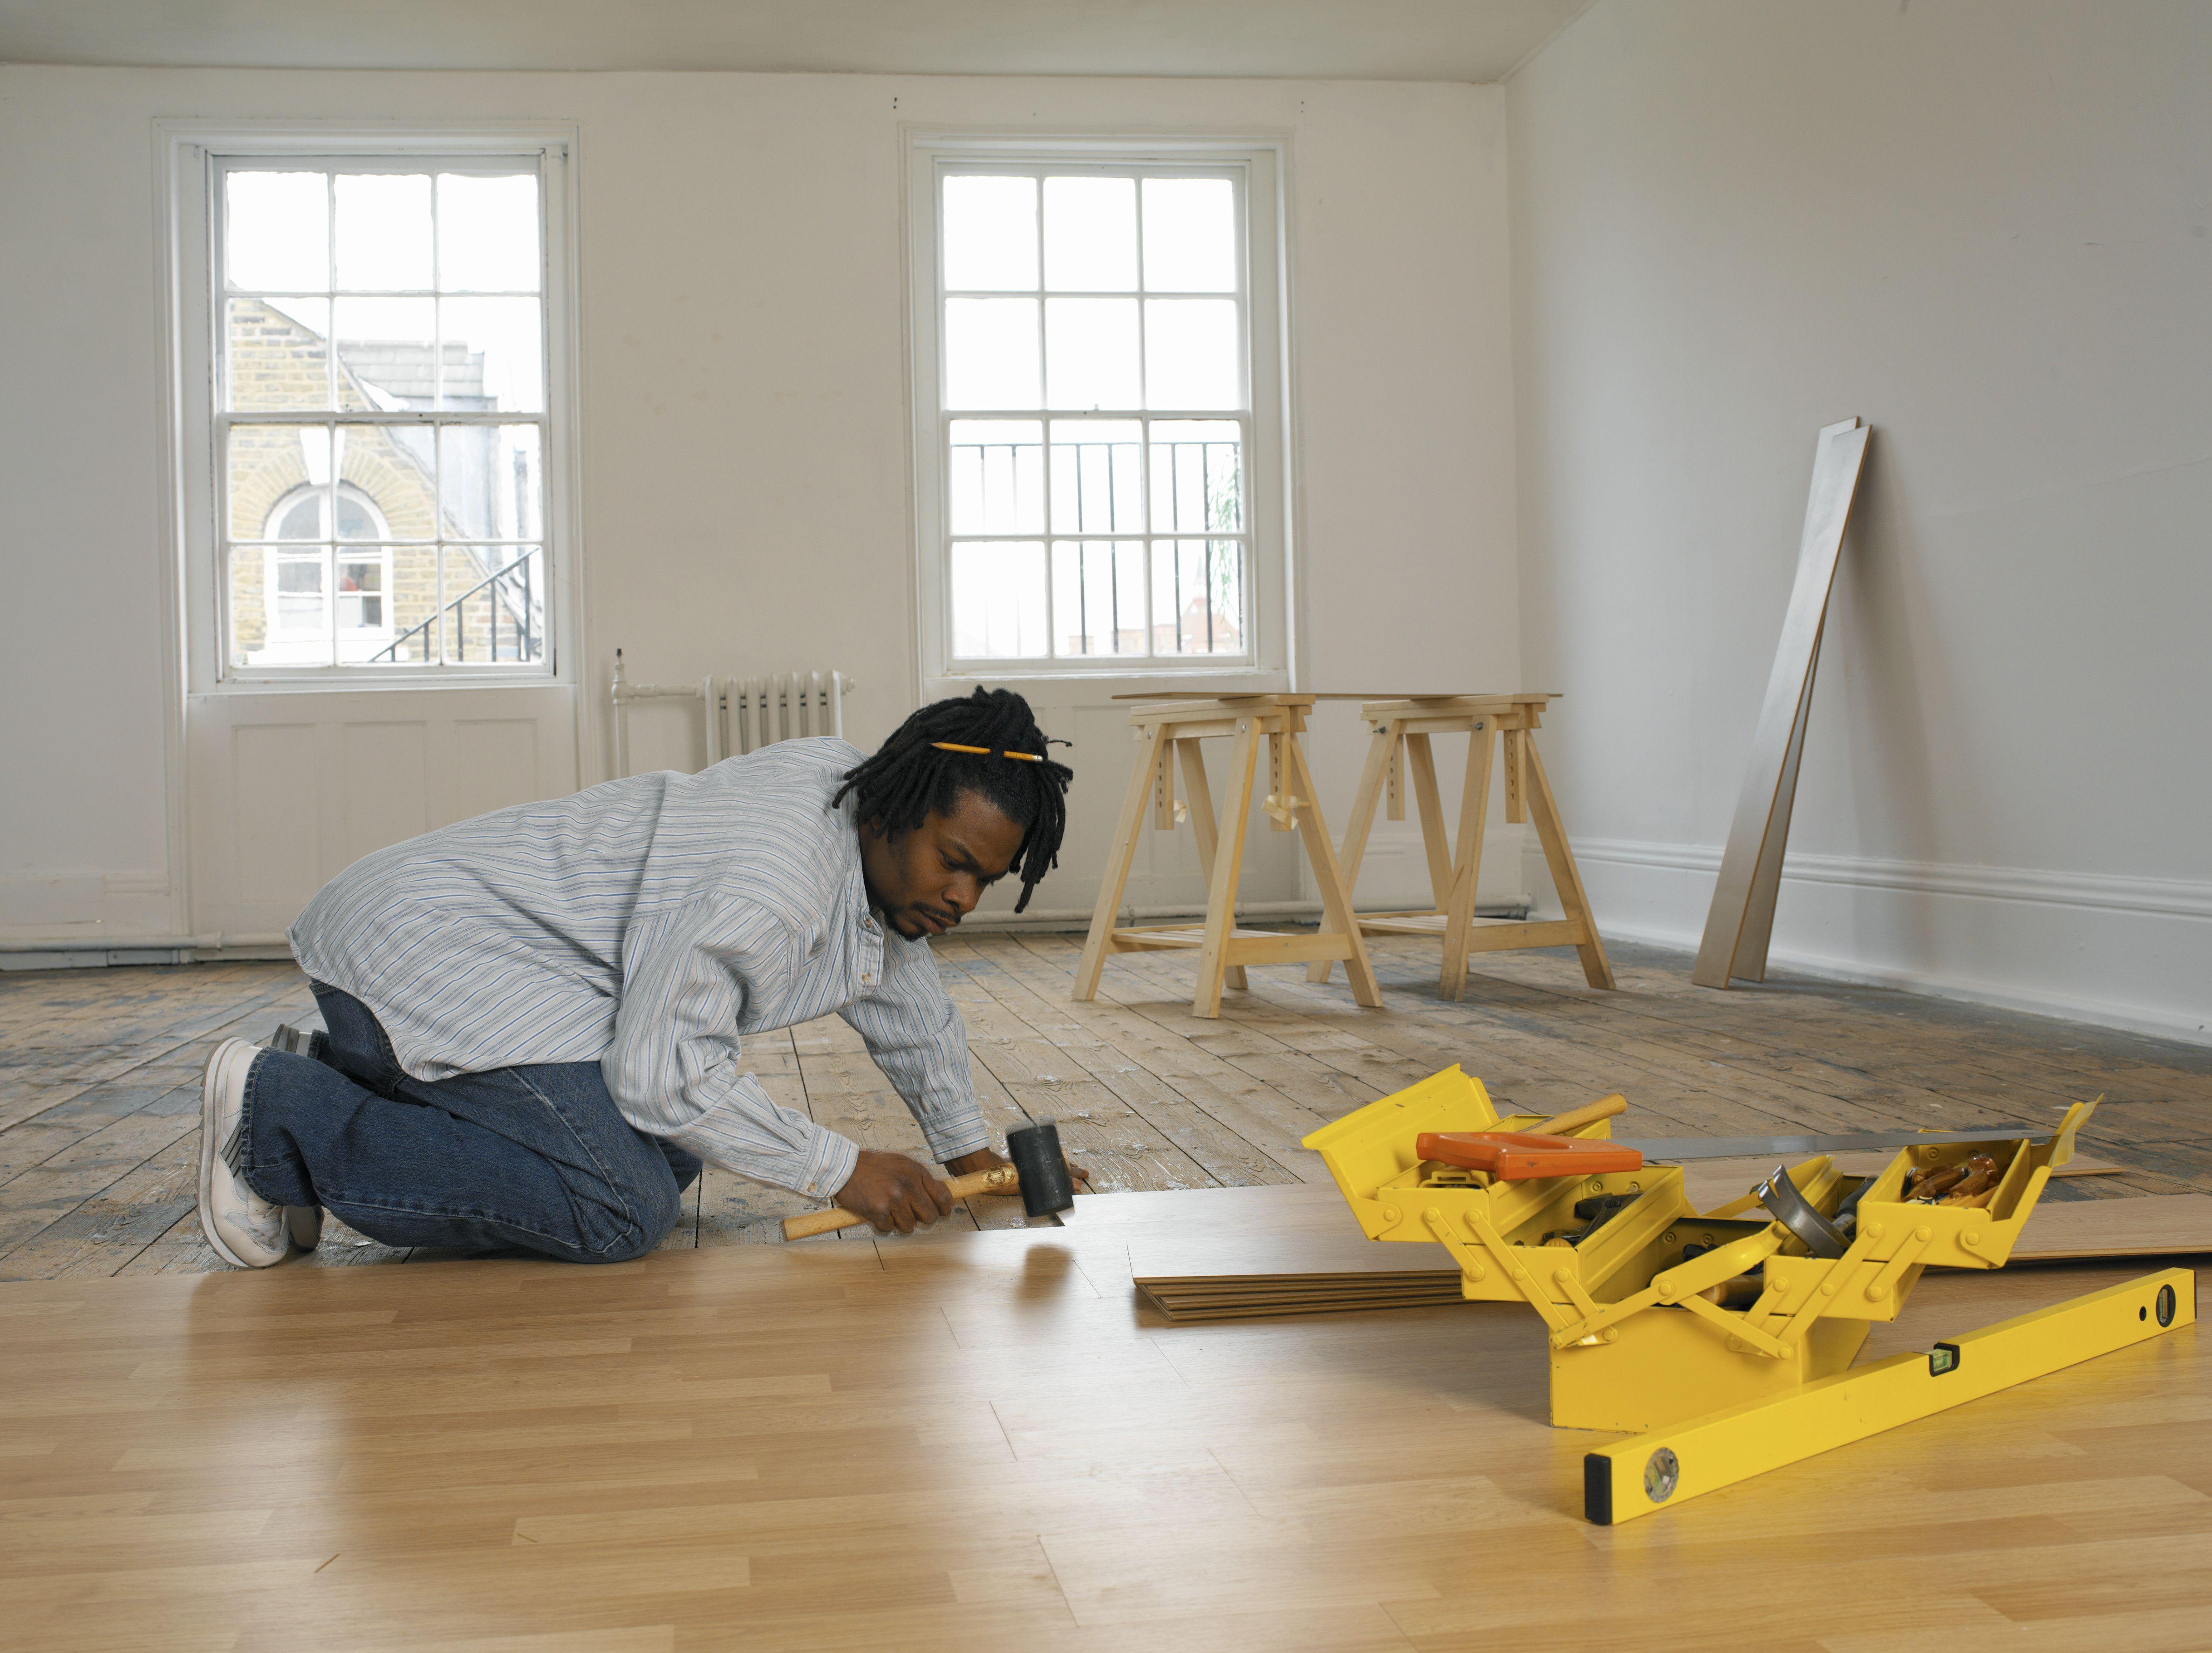 Major Manufacturing Brands for Laminate Flooring